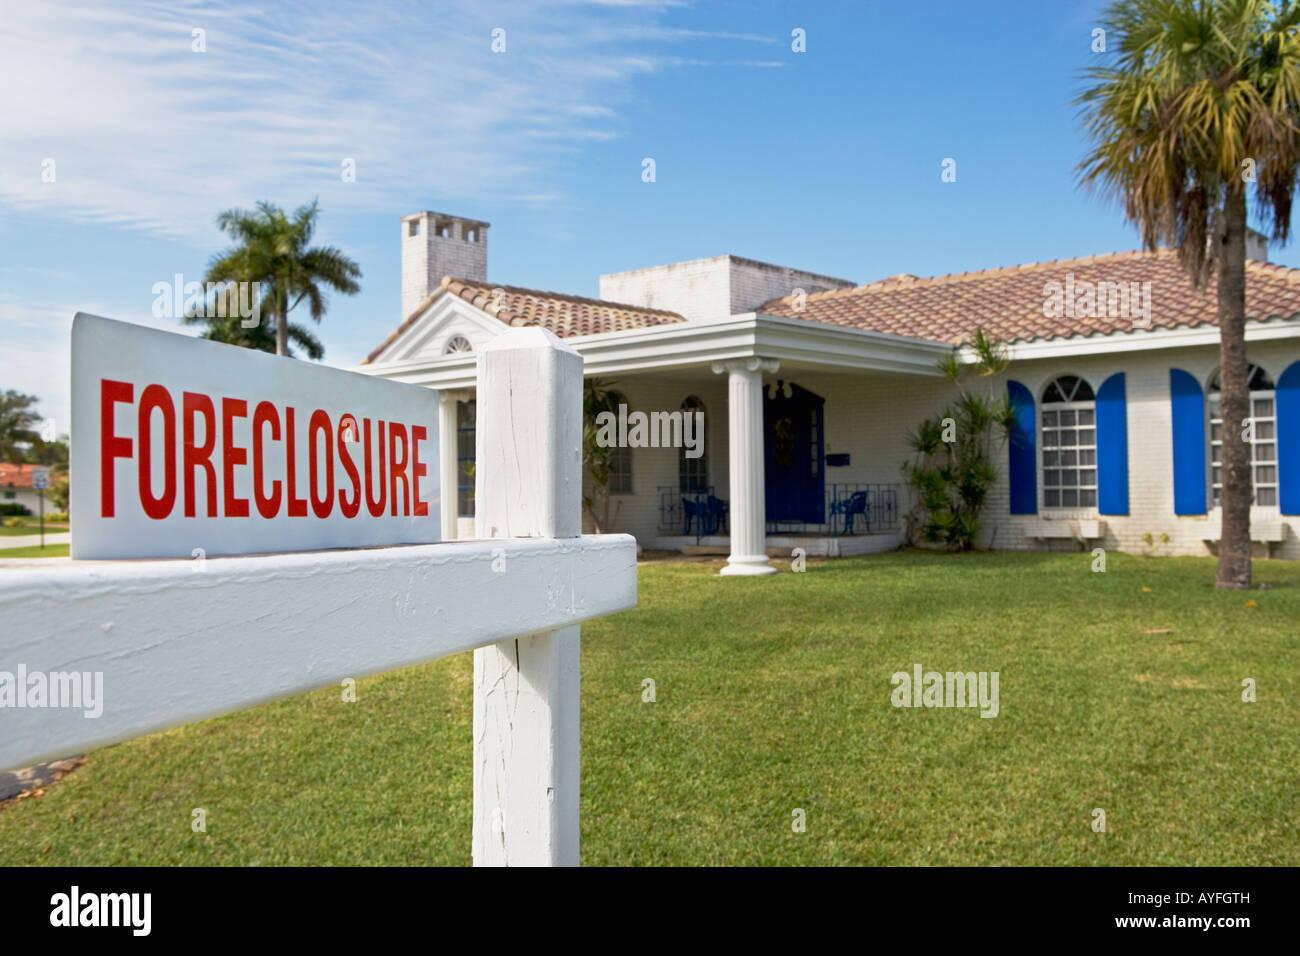 Signe de forclusion, immobilier Photo Stock